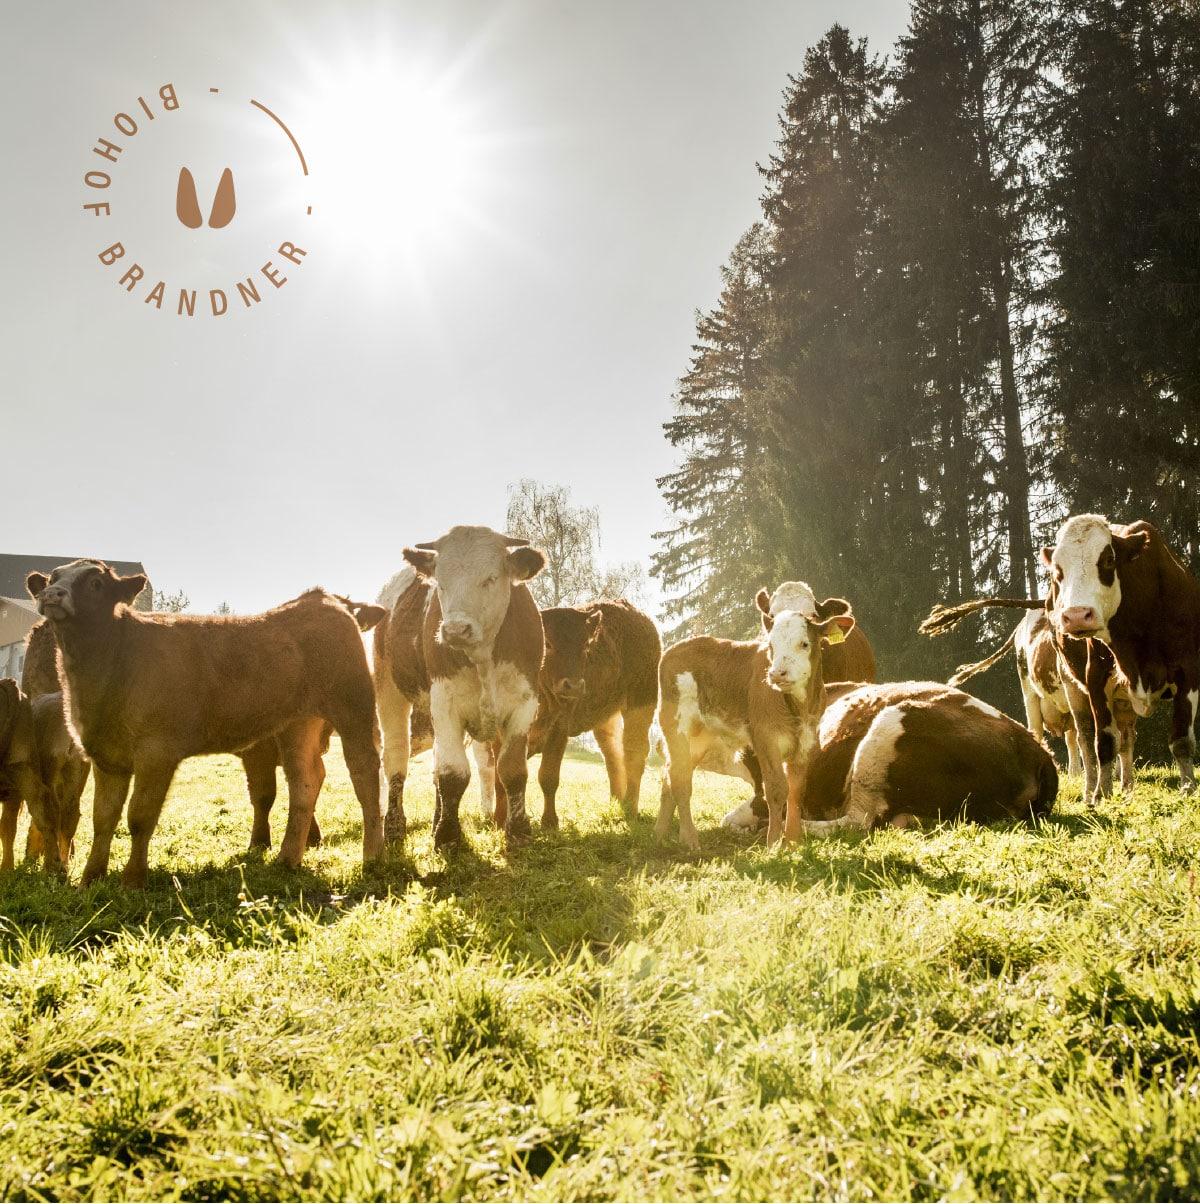 Rinder vom Biohof Brandner Steiermark